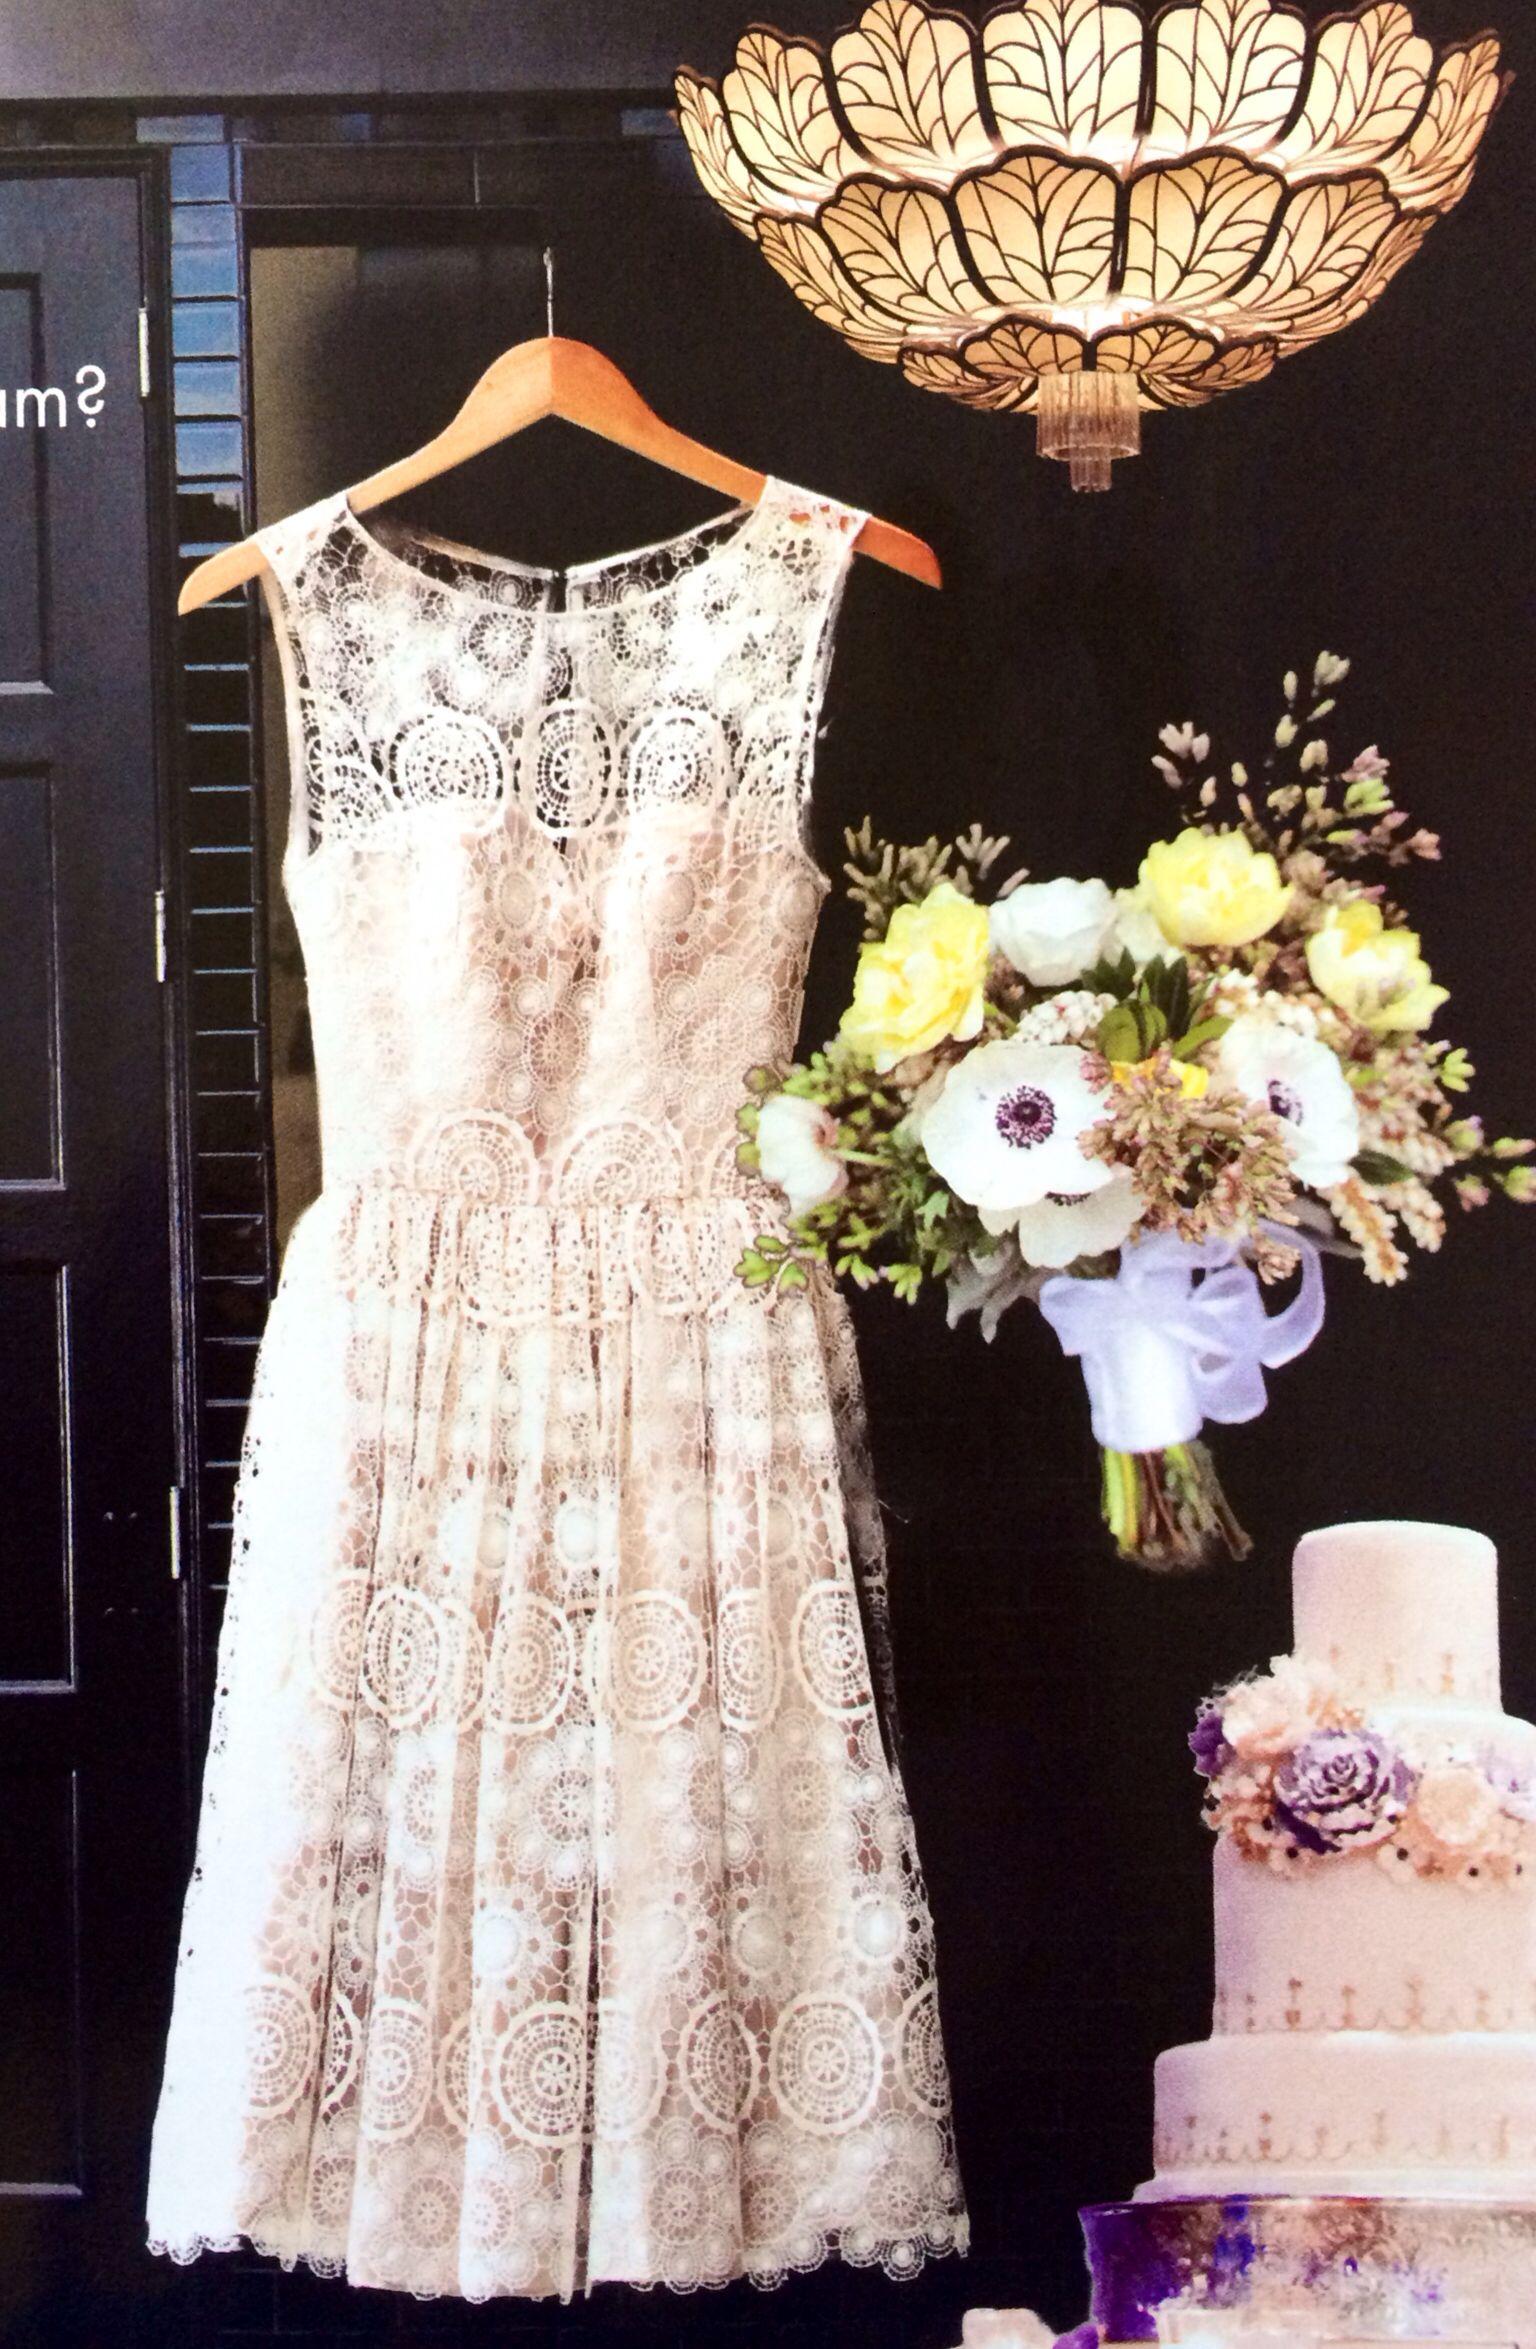 Cute short wedding dresses  Neon Orange Fuchsia Navy Printed Scarf Lightweight Spring Summer